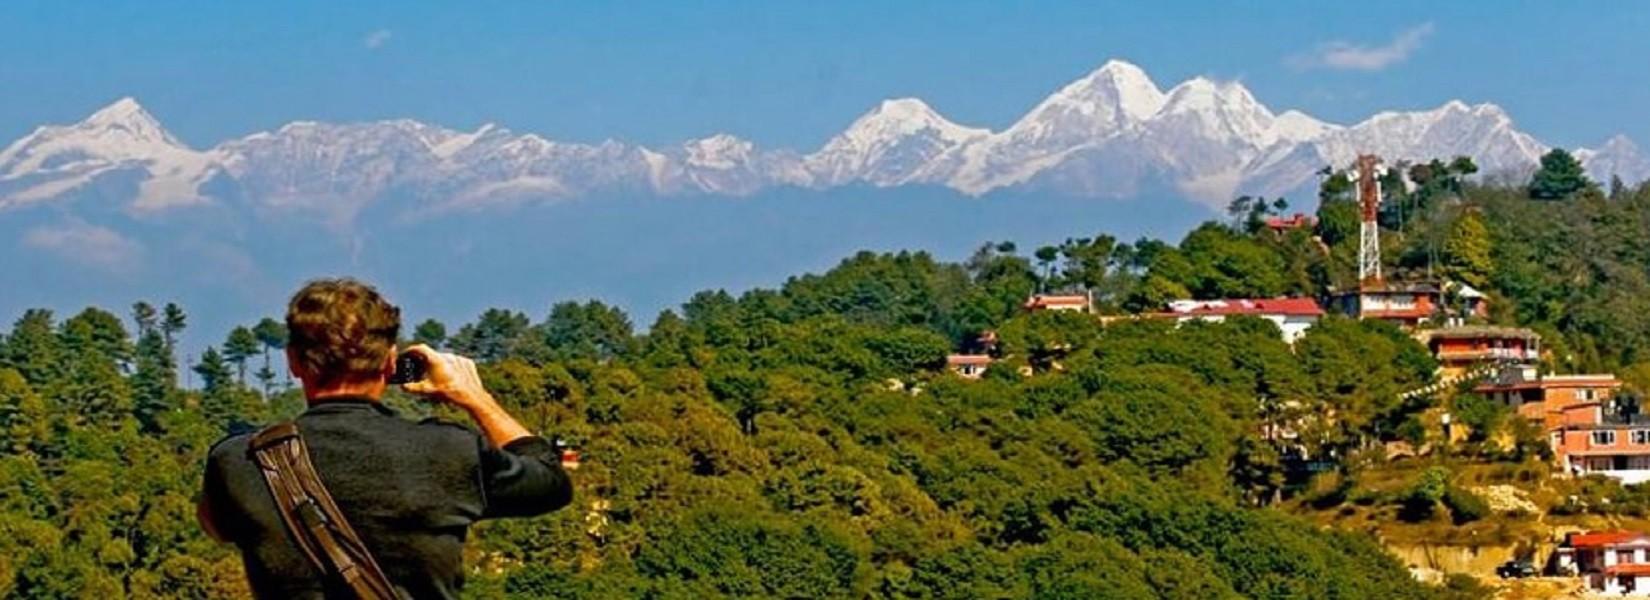 Chisopani-Nagarkot-Hiking